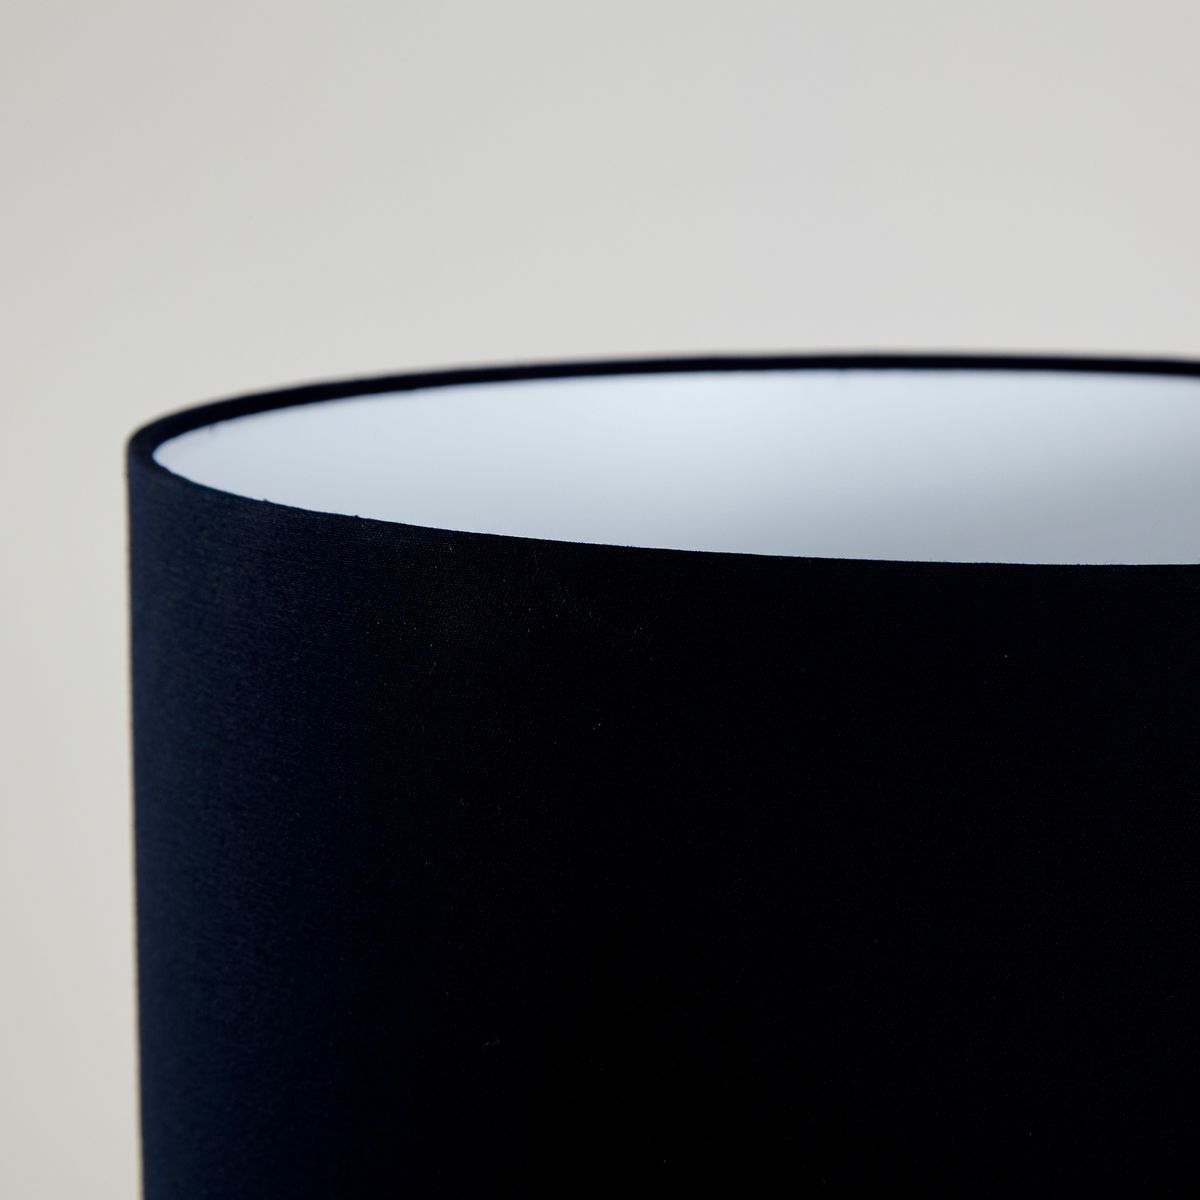 lampe in schwarz gold 1950er bei pamono kaufen. Black Bedroom Furniture Sets. Home Design Ideas